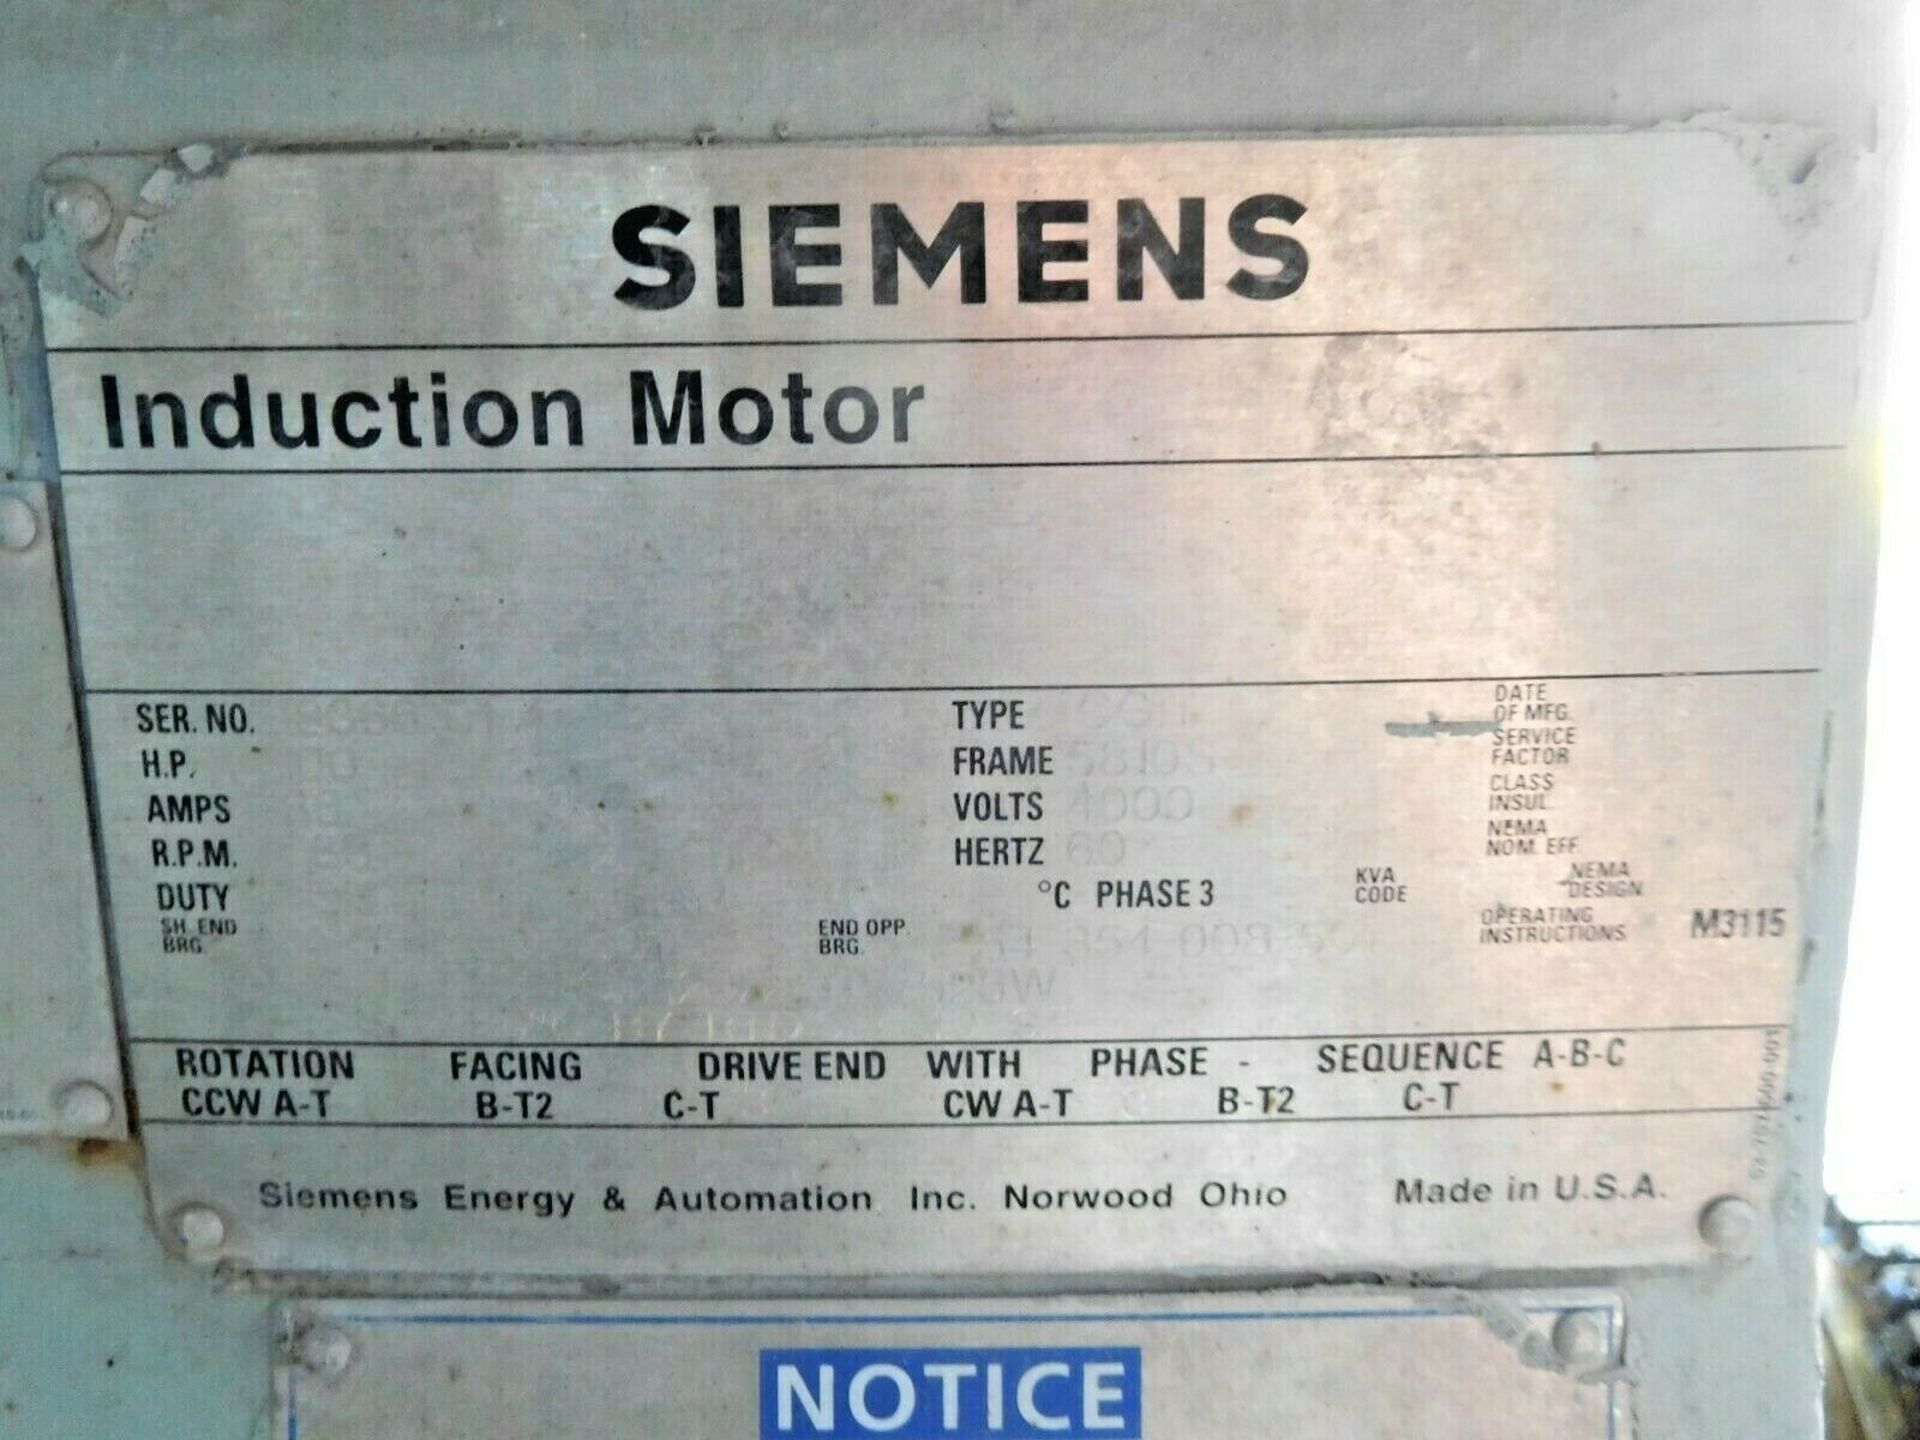 Siemens 1100 HP Electric Motor. 4000 V. 3 Ph. 1783 RPM. CGII. 5810S. 60 Hz. - Image 3 of 3